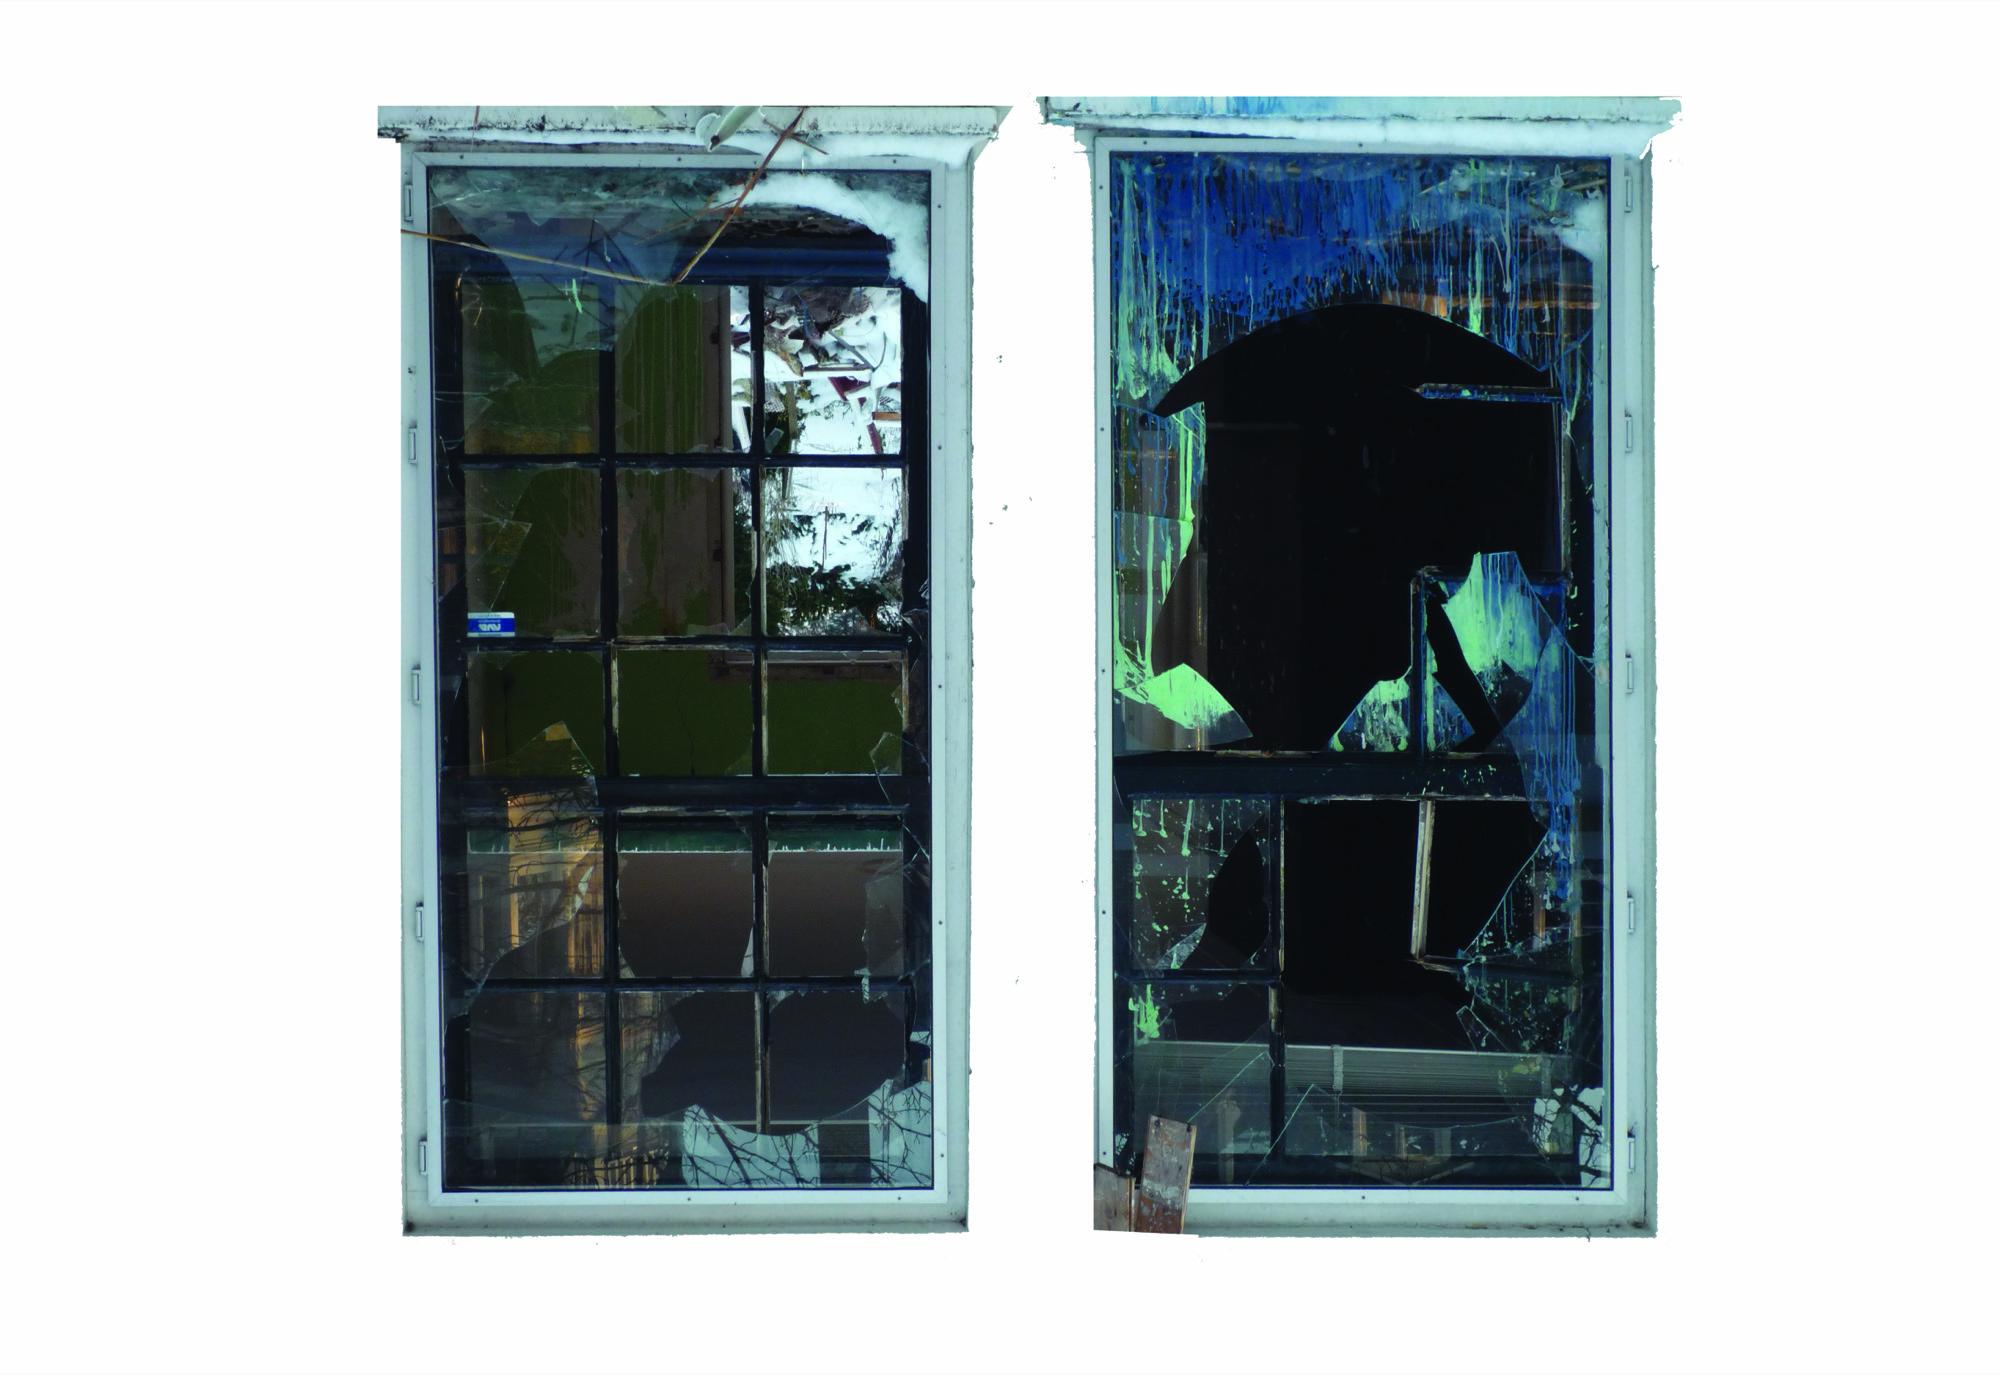 Bleu Window Bloemendaal I